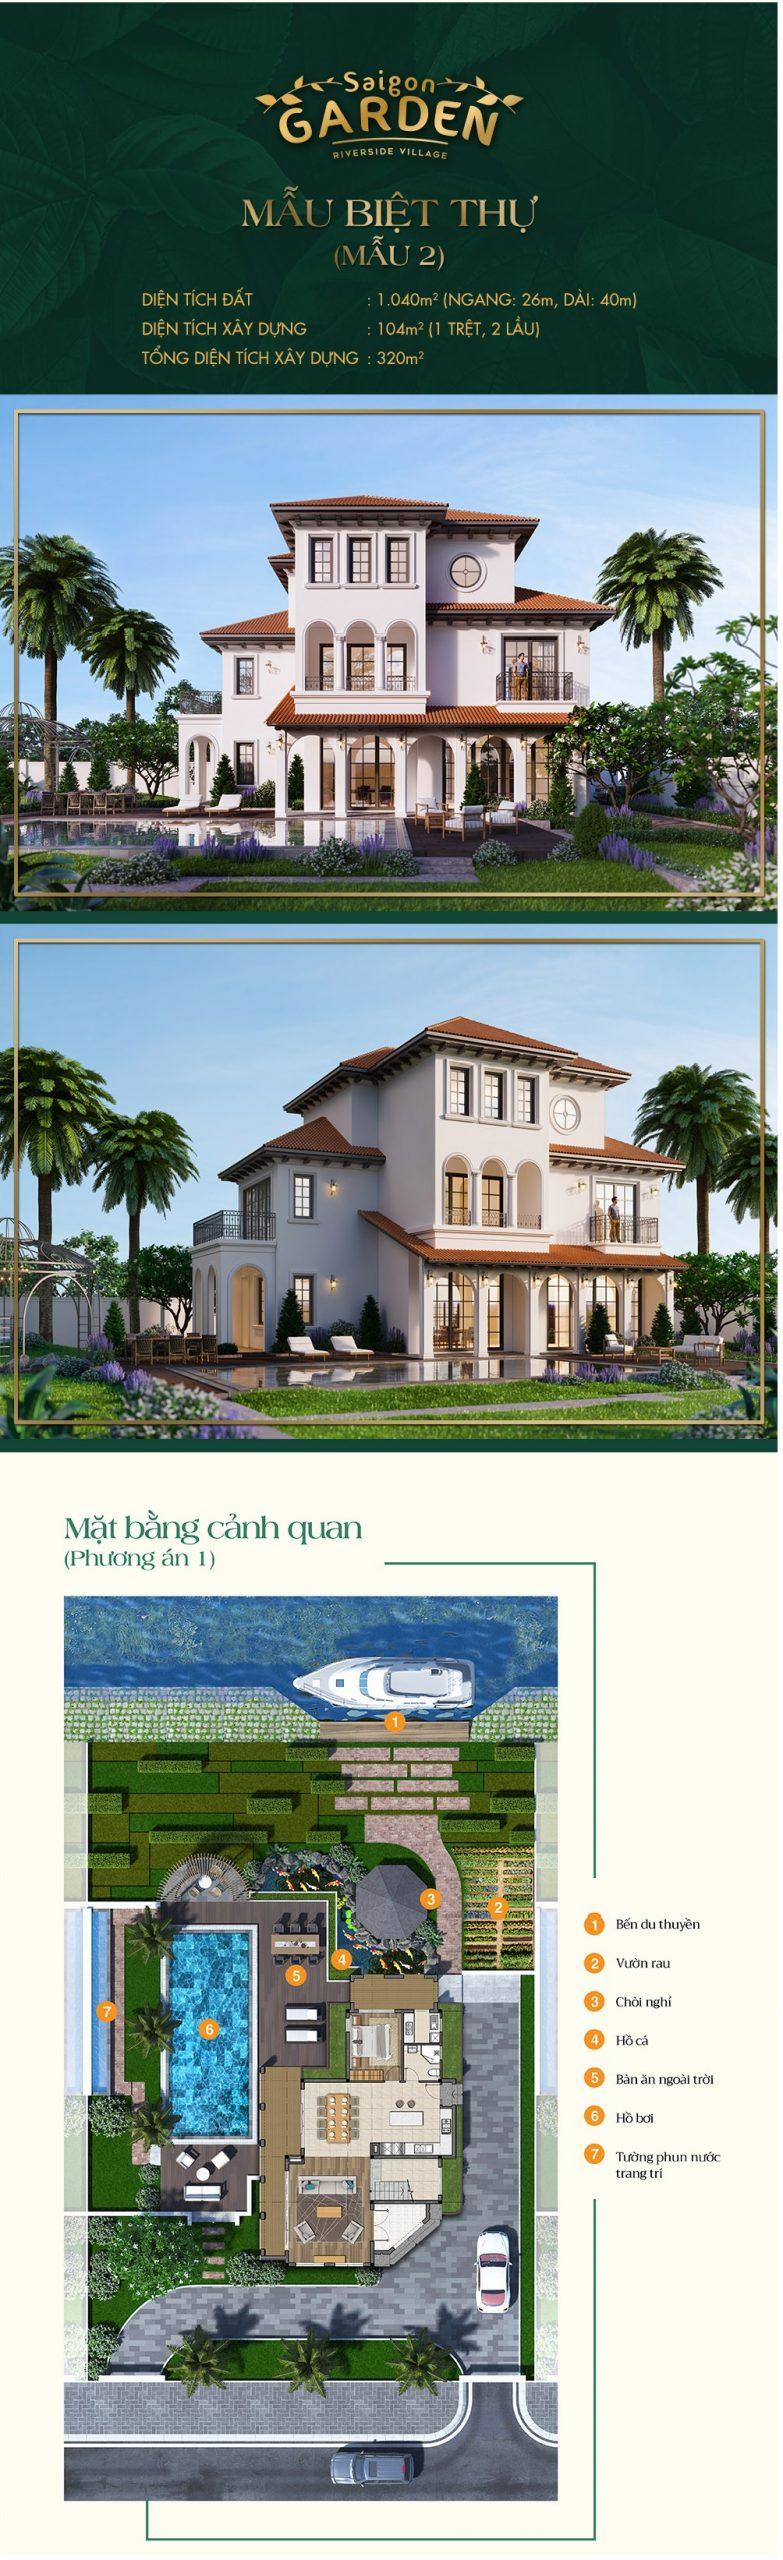 Mẫu thiết kế dự án Saigon garden riverside